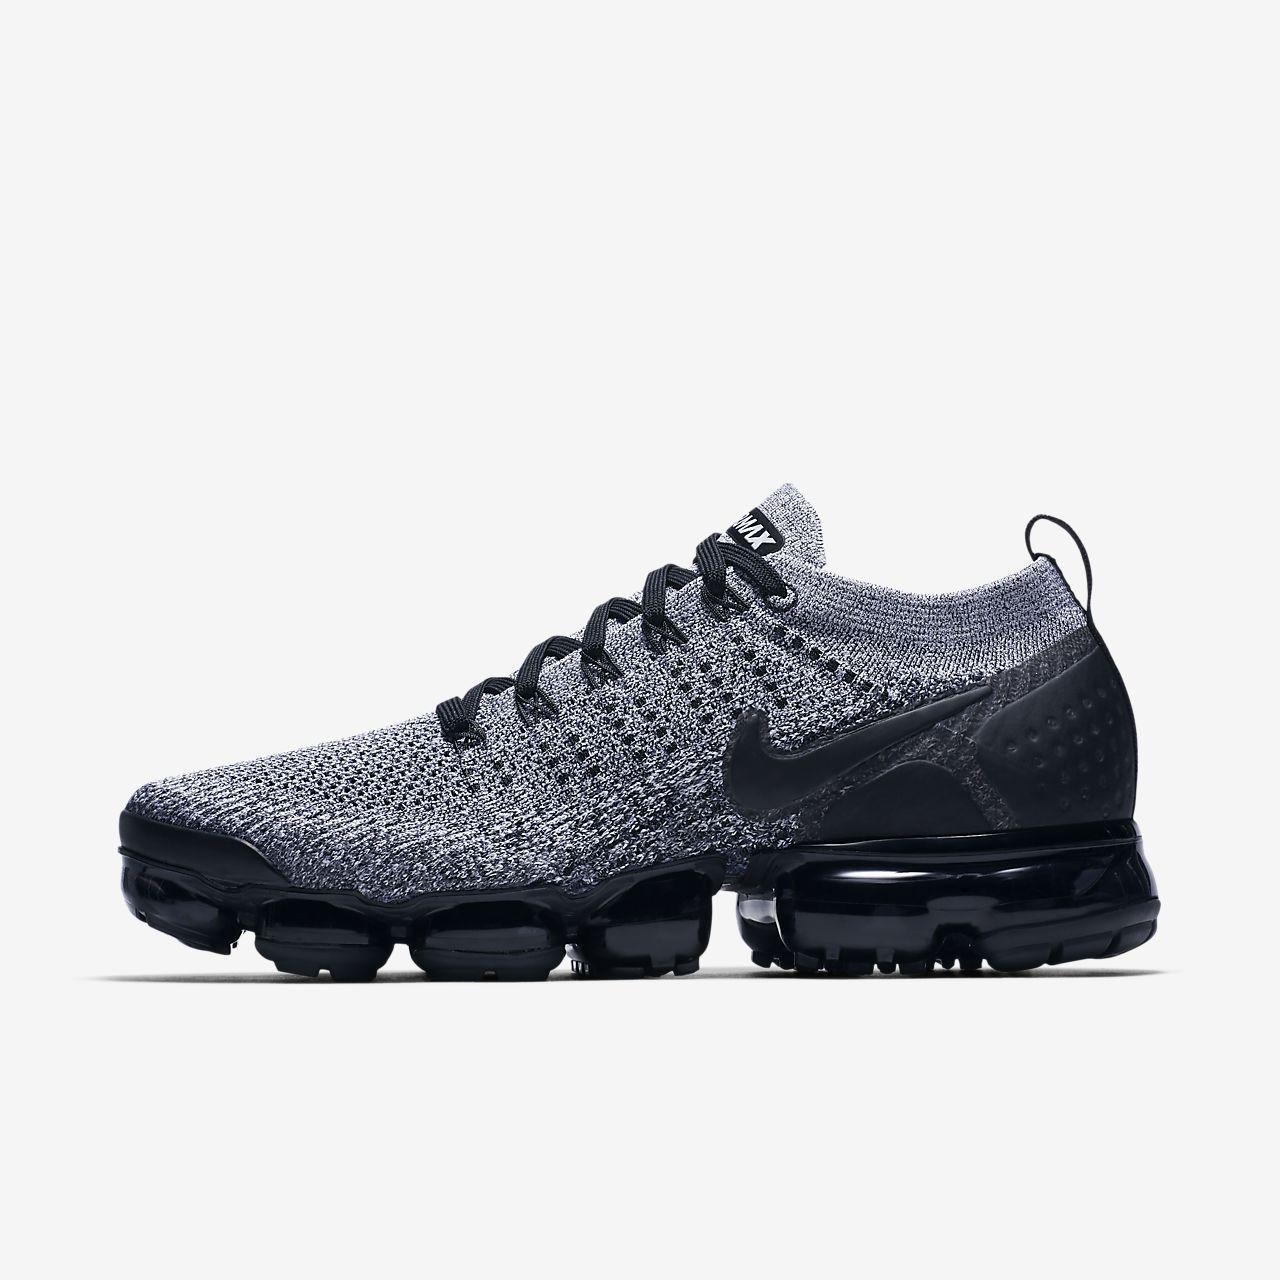 reputable site 85ae1 3b20e Shoe. Nike Air VaporMax Flyknit 2